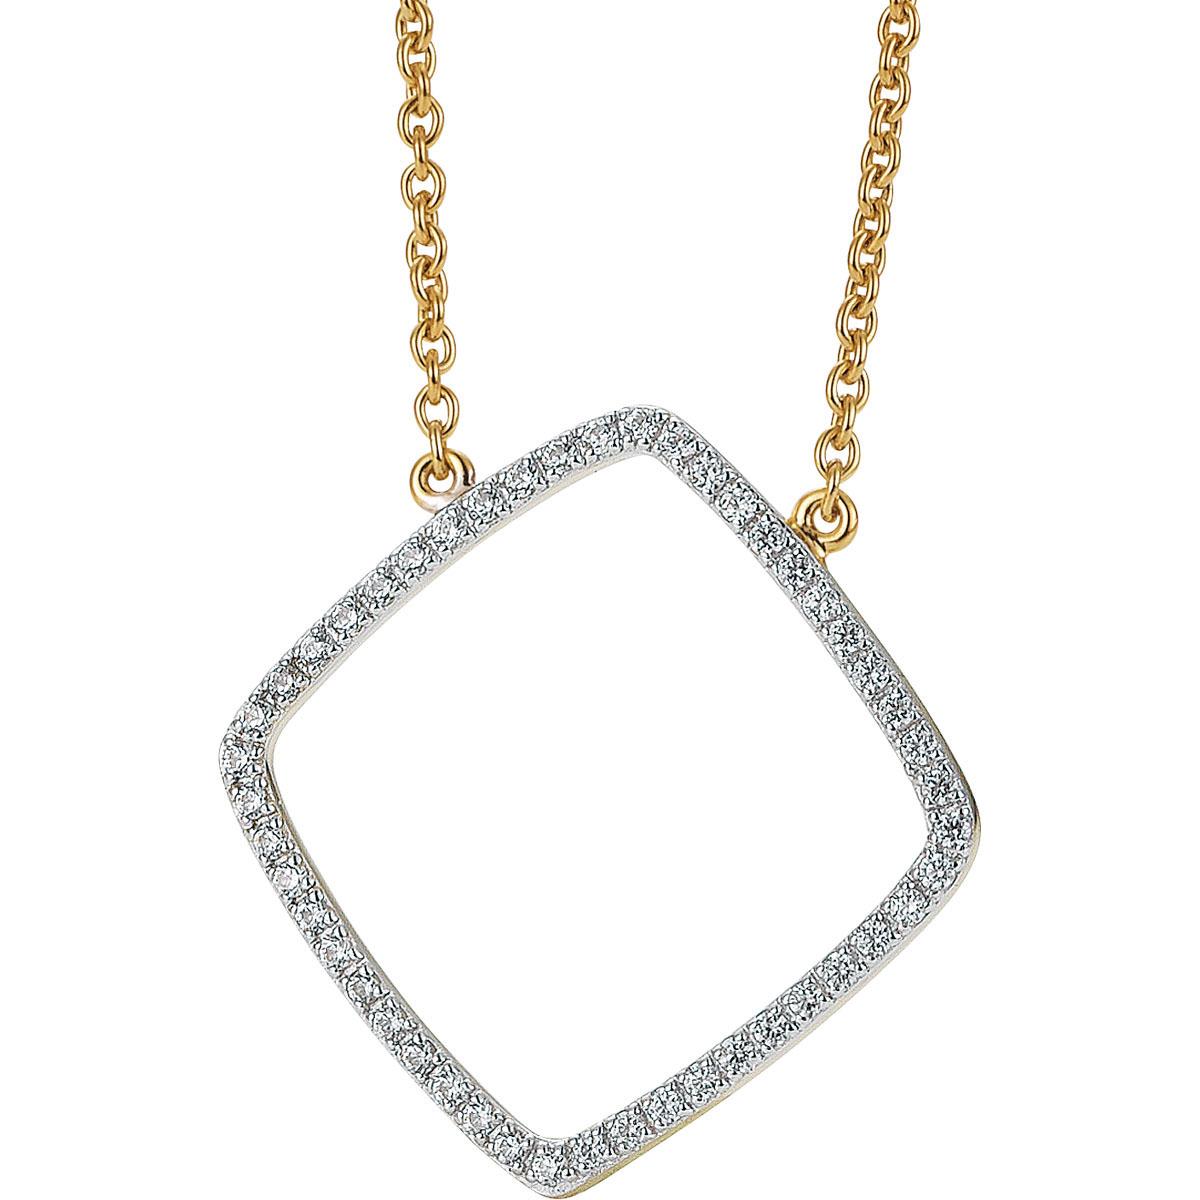 Wholesale custom OEM/ODM Jewelry cz pendants gold plated jewelry manufacturers